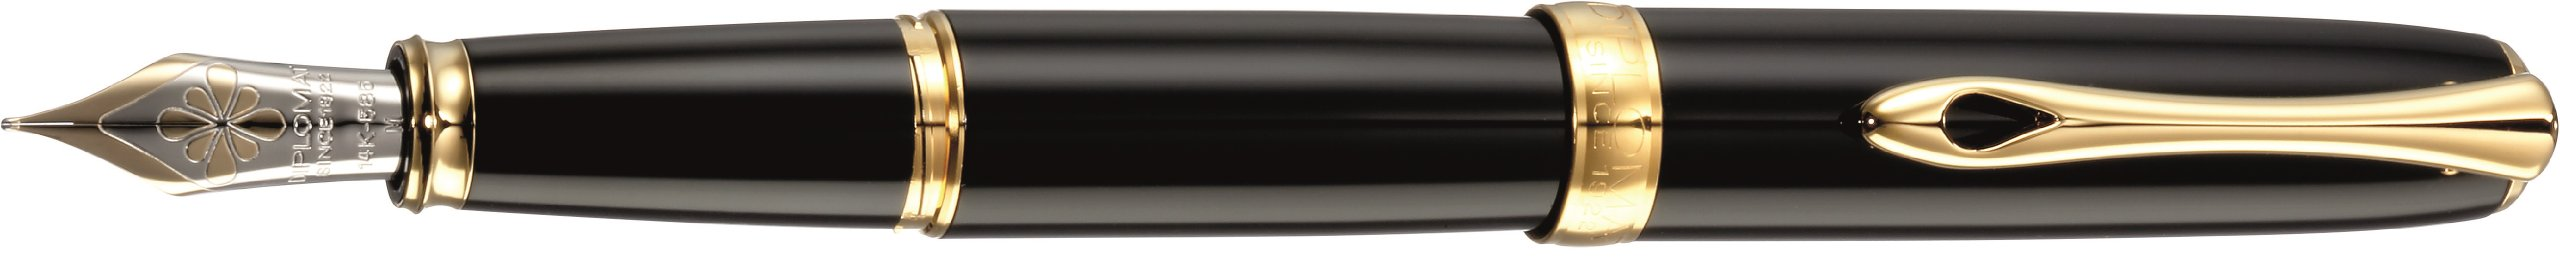 Diplomat Excellence A plus, black lacquer gold, fountain pen, 14ct gold nib F fine